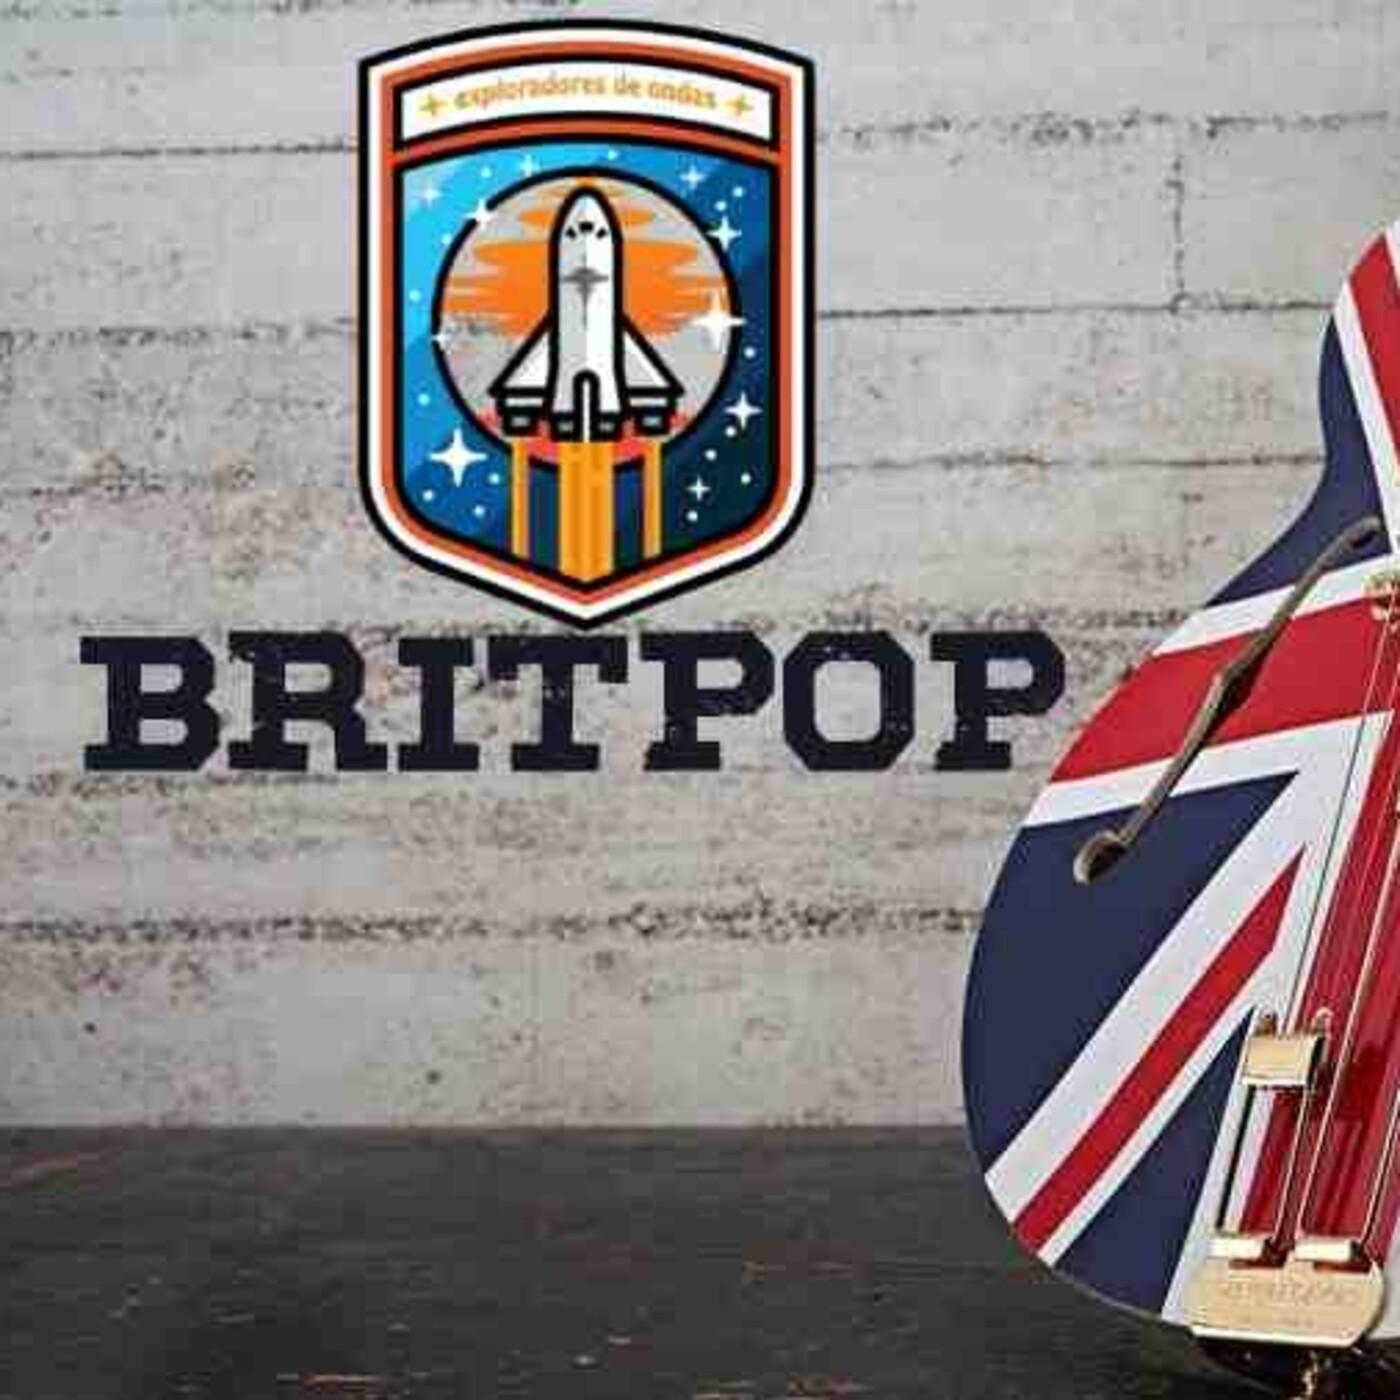 Exploradores de ondas #11 Britpop